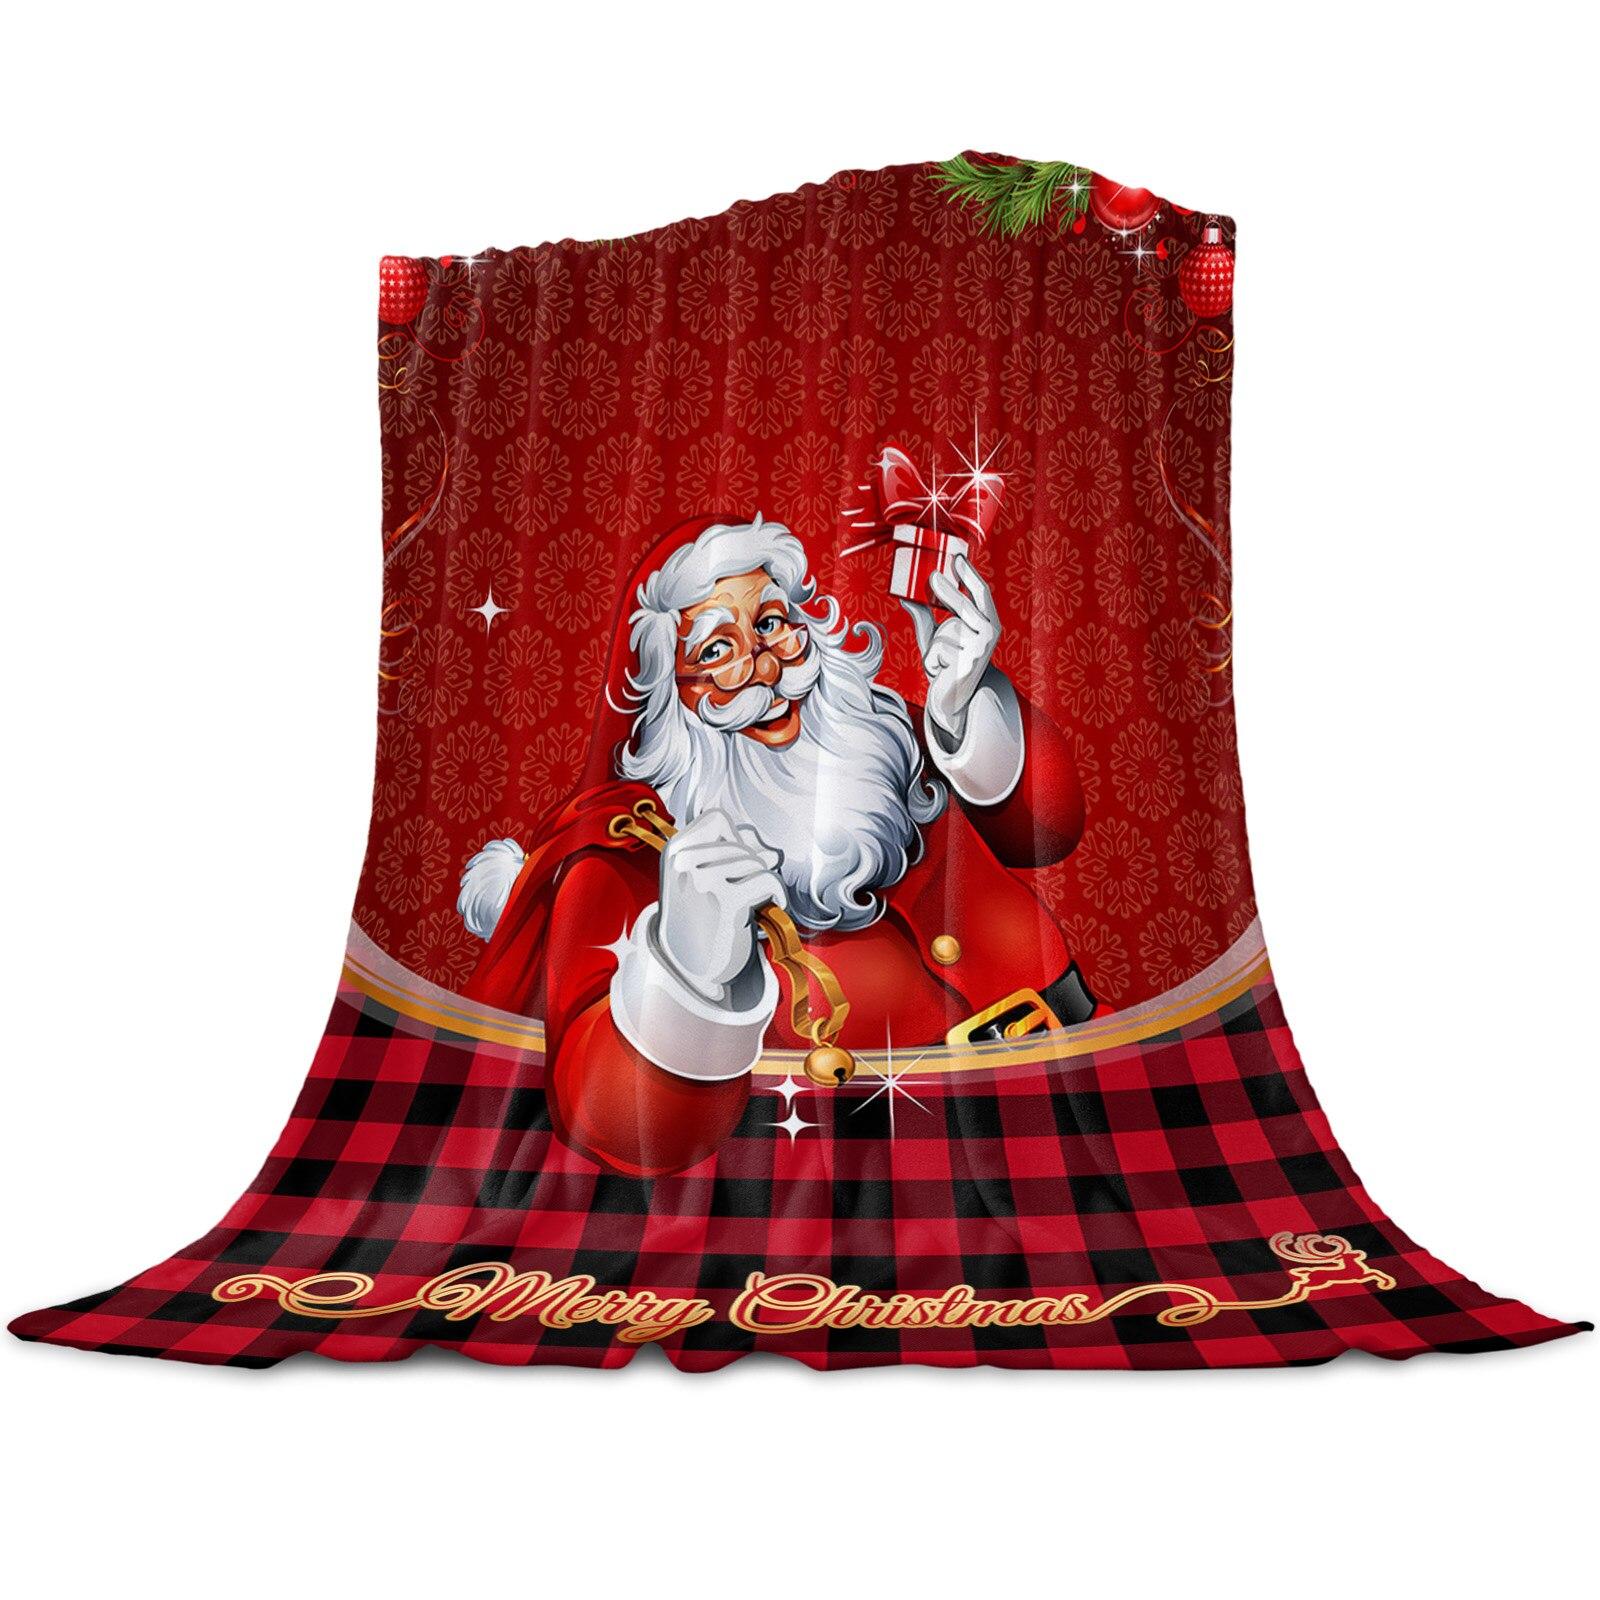 Santa Claus Lattice Gift Lantern Throw Blanket for Beds Microfiber Flannel Warm Blanket Sofa Bedding Bedspread Gifts